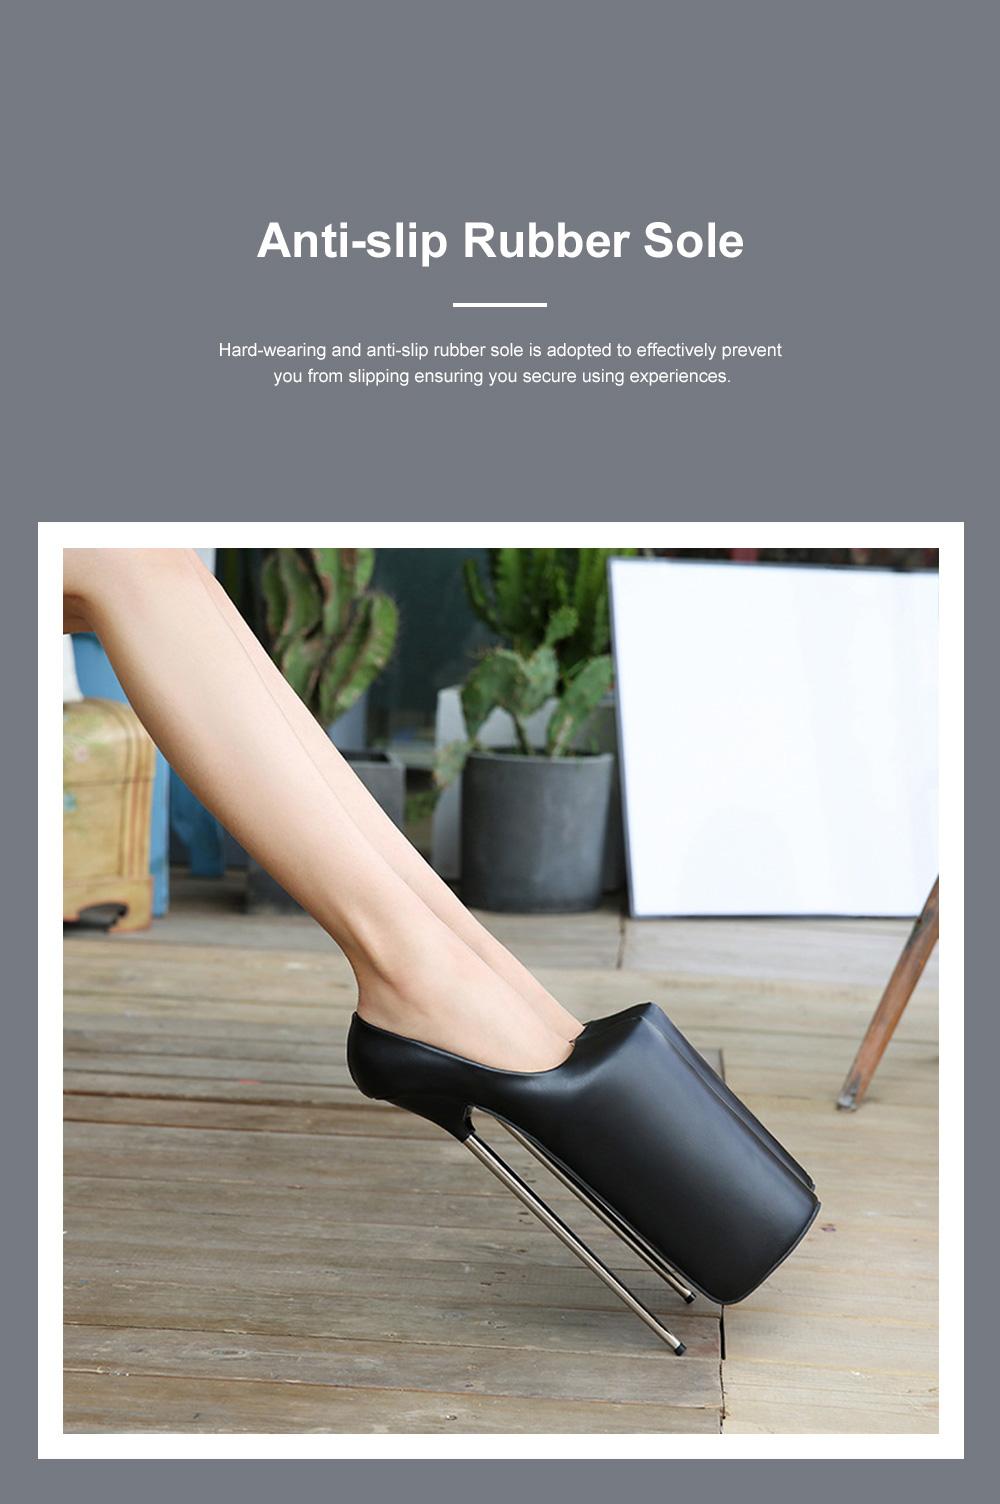 Stylish Sexy 30cm Platform Design High Heels Soft Skin-friendly PU Night Club Shoes with Anti-slip Rubber Sole Ins Hot 4